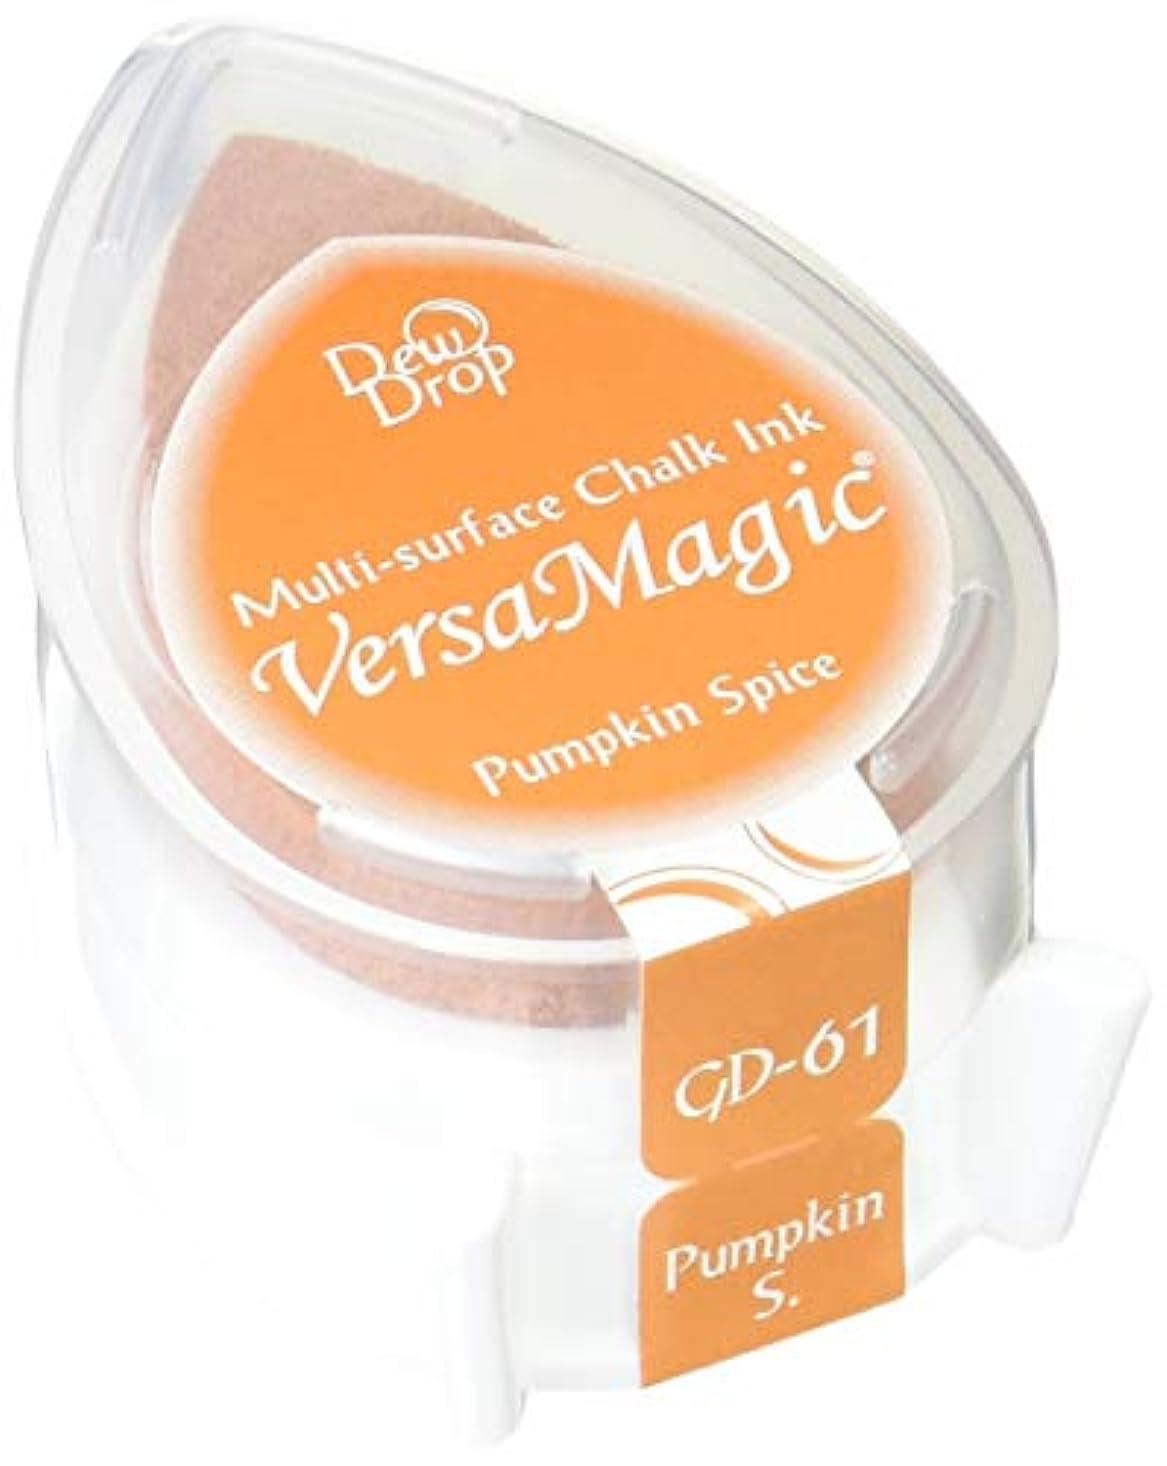 Tsukineko VersaMagic Dew Drop Inkpad of All Kinds, Pumpkin Spice xoidyxrdtgnbxk